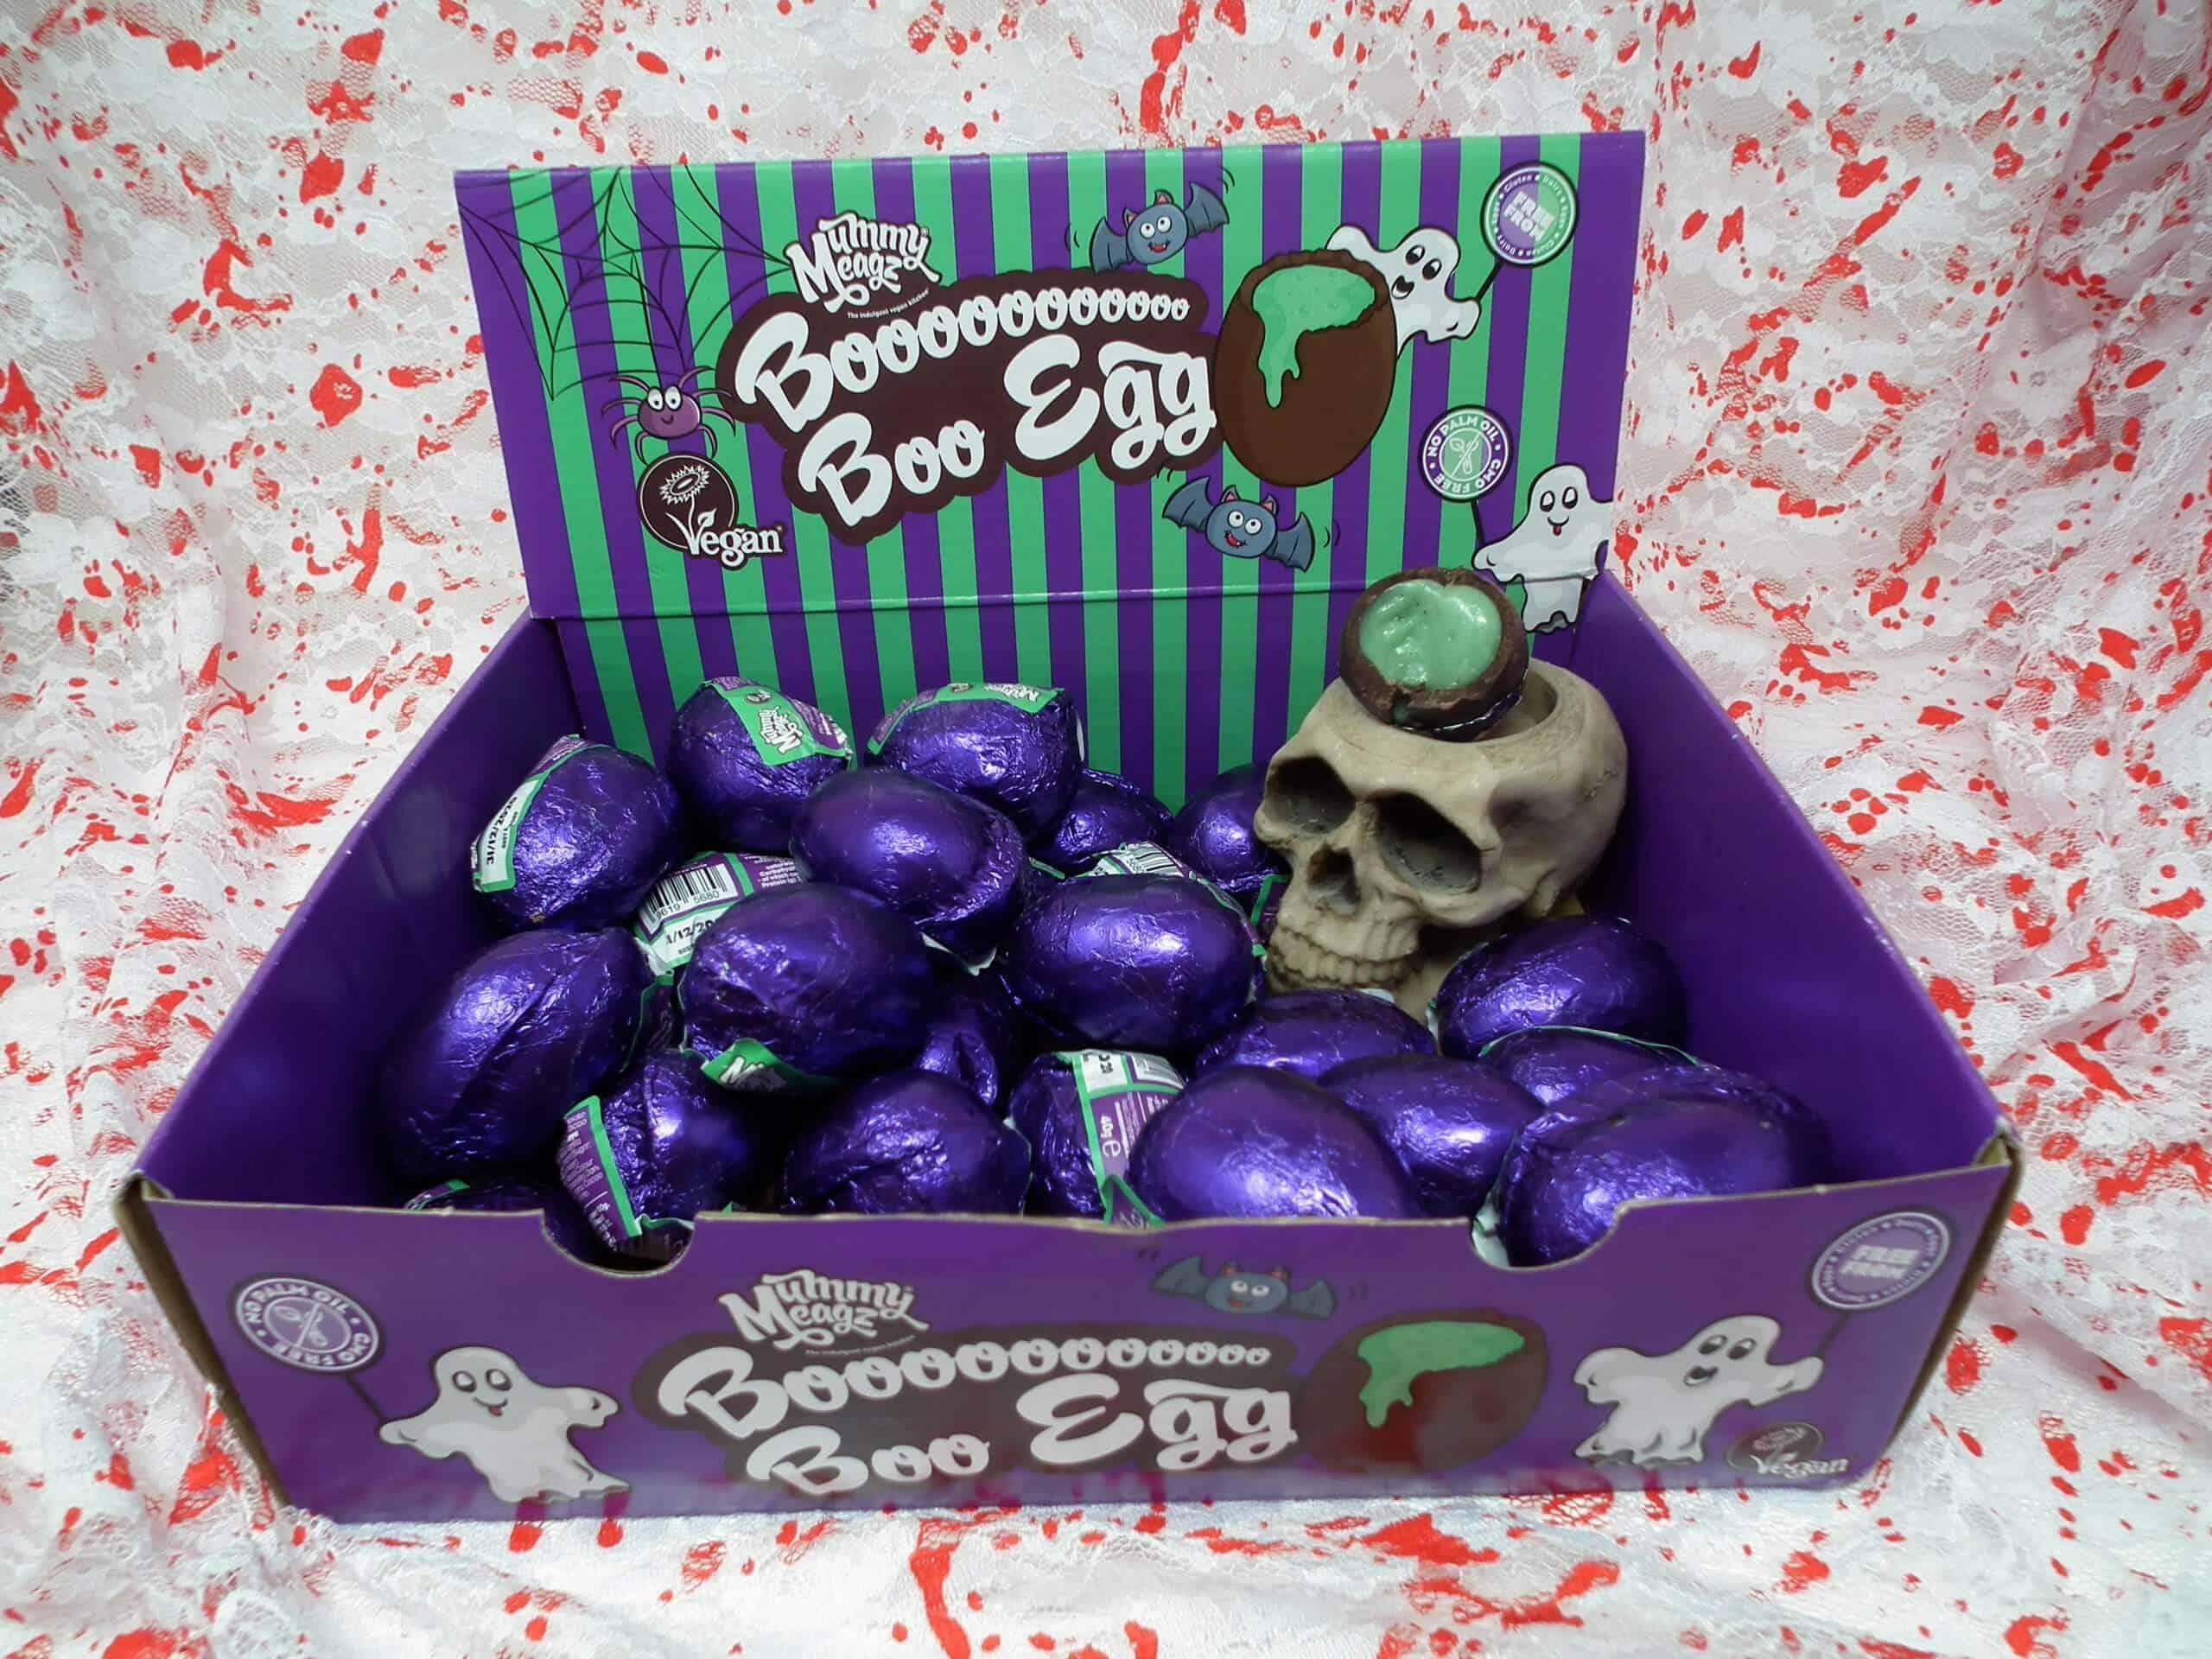 Mummy Meagz Boo Boo Egg Halloween